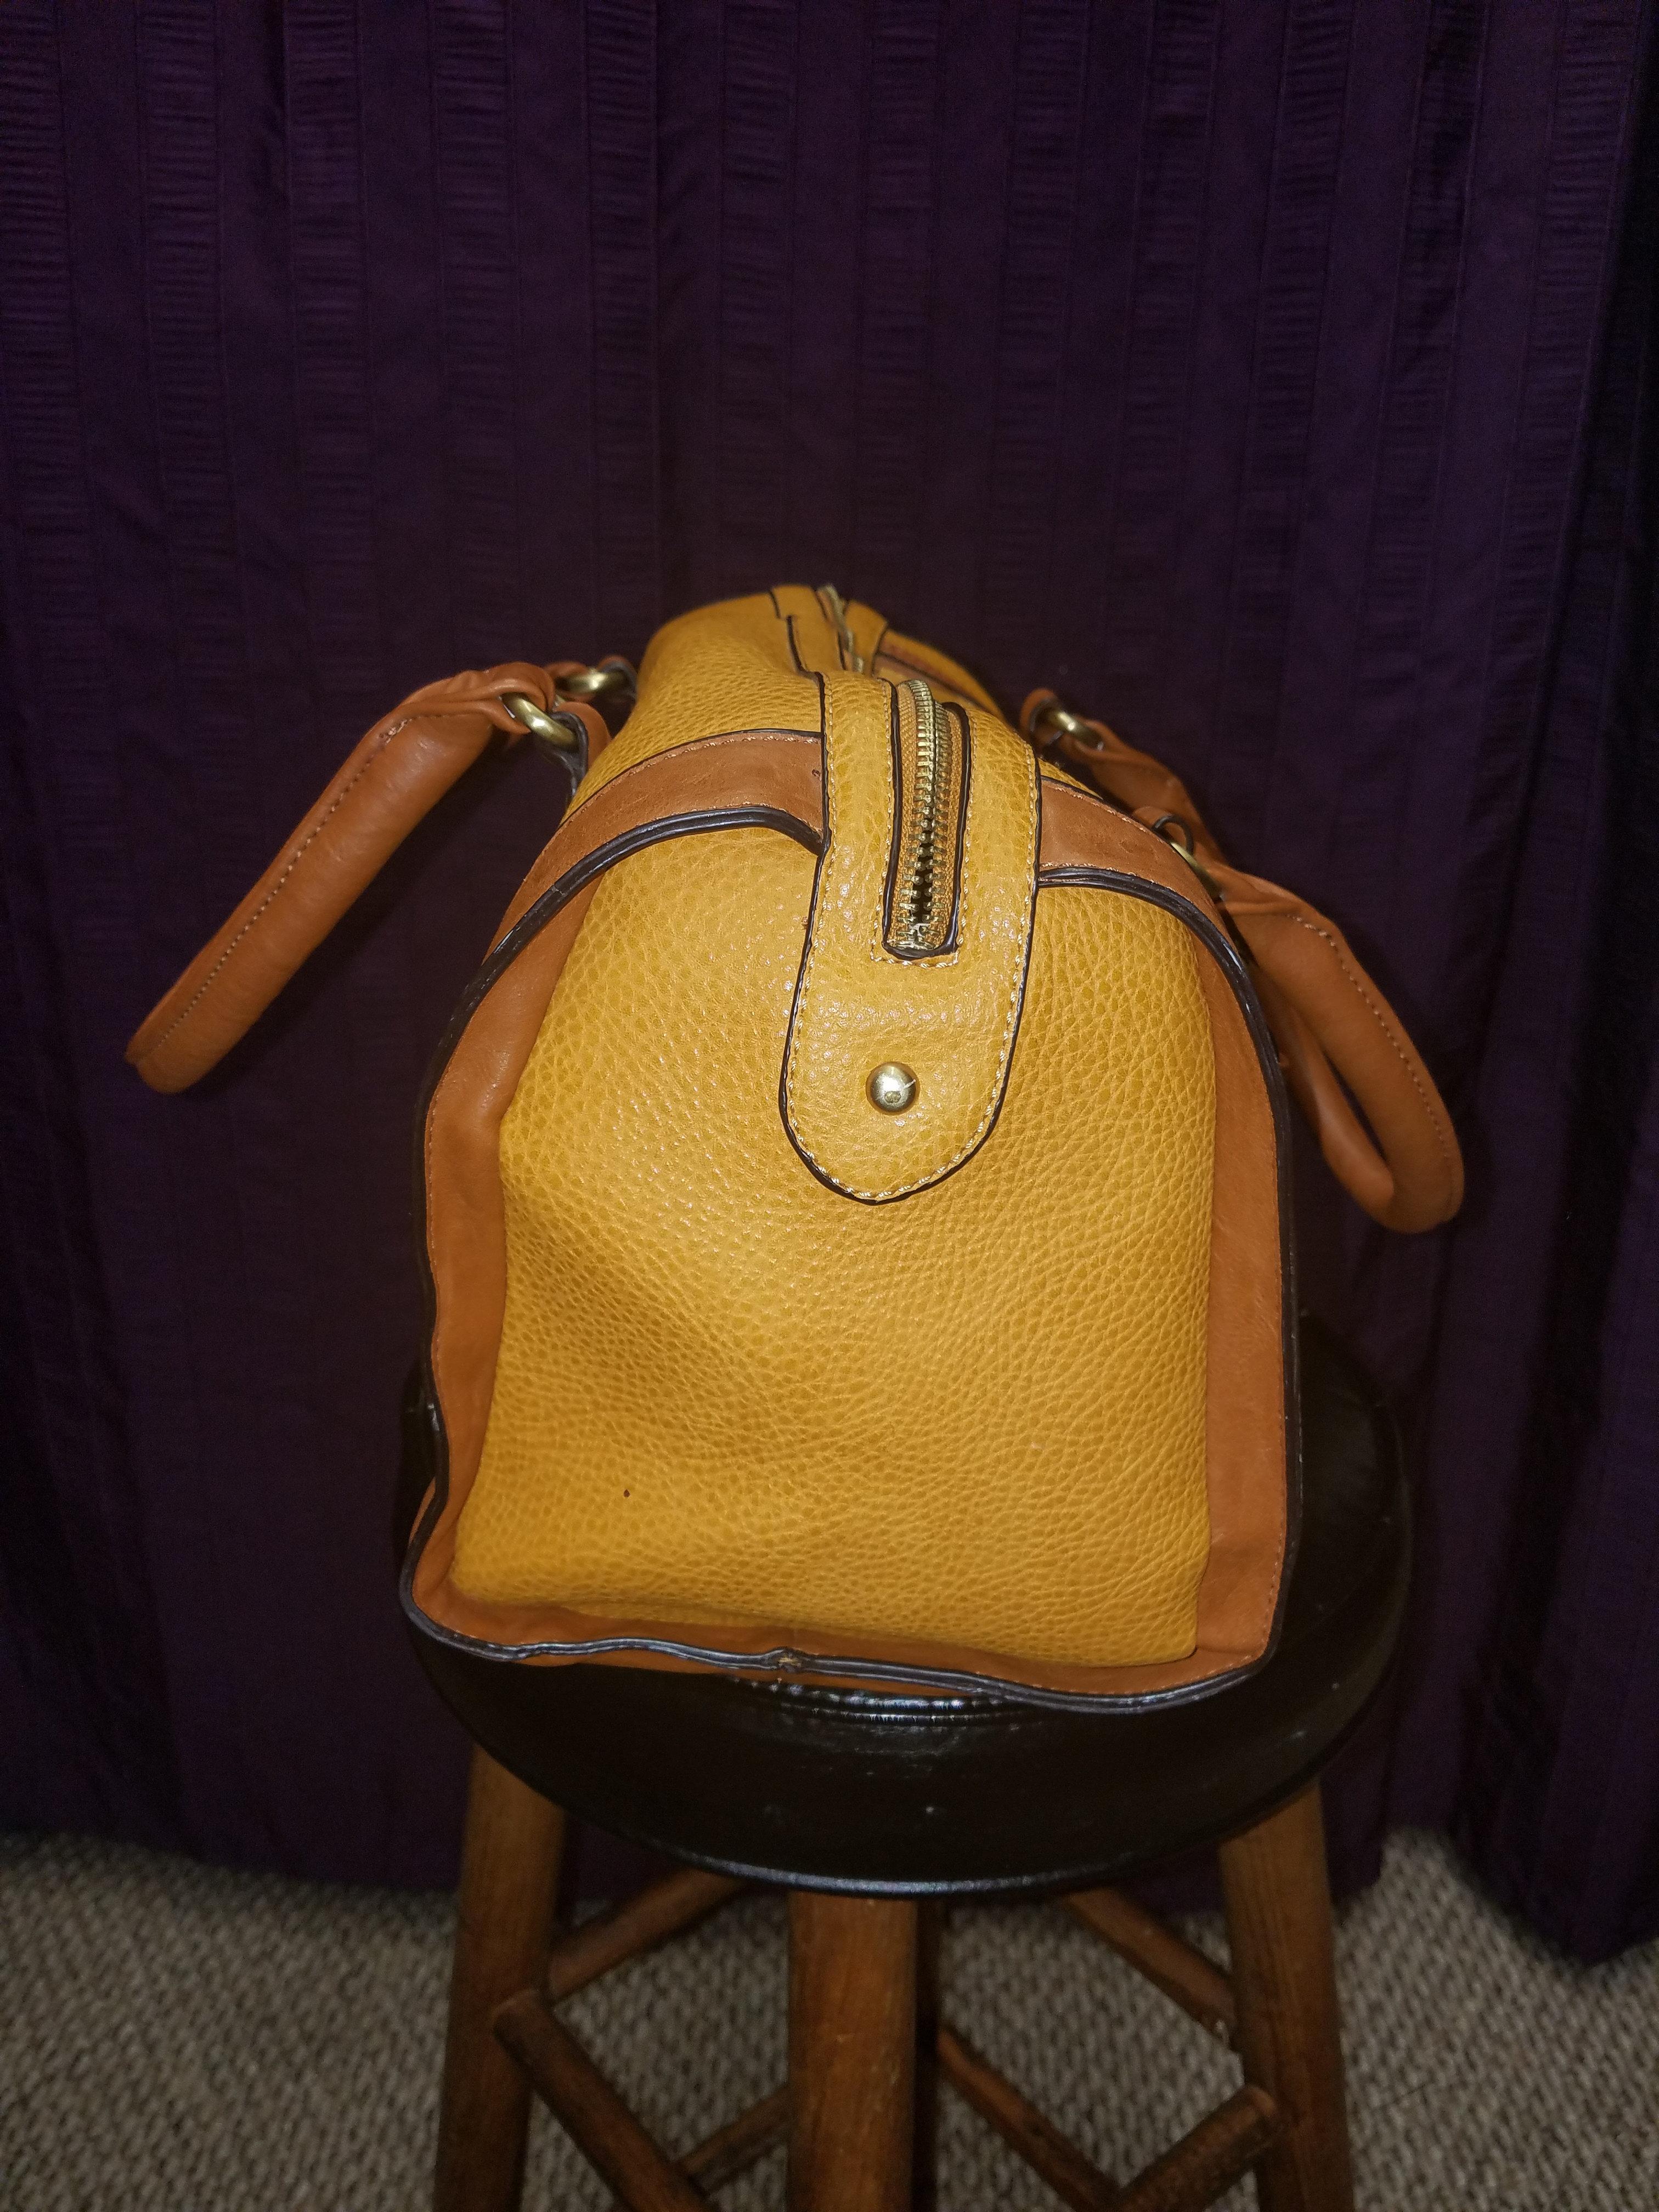 01528712900 ALDO Canary yellow and tan leather-like handbag